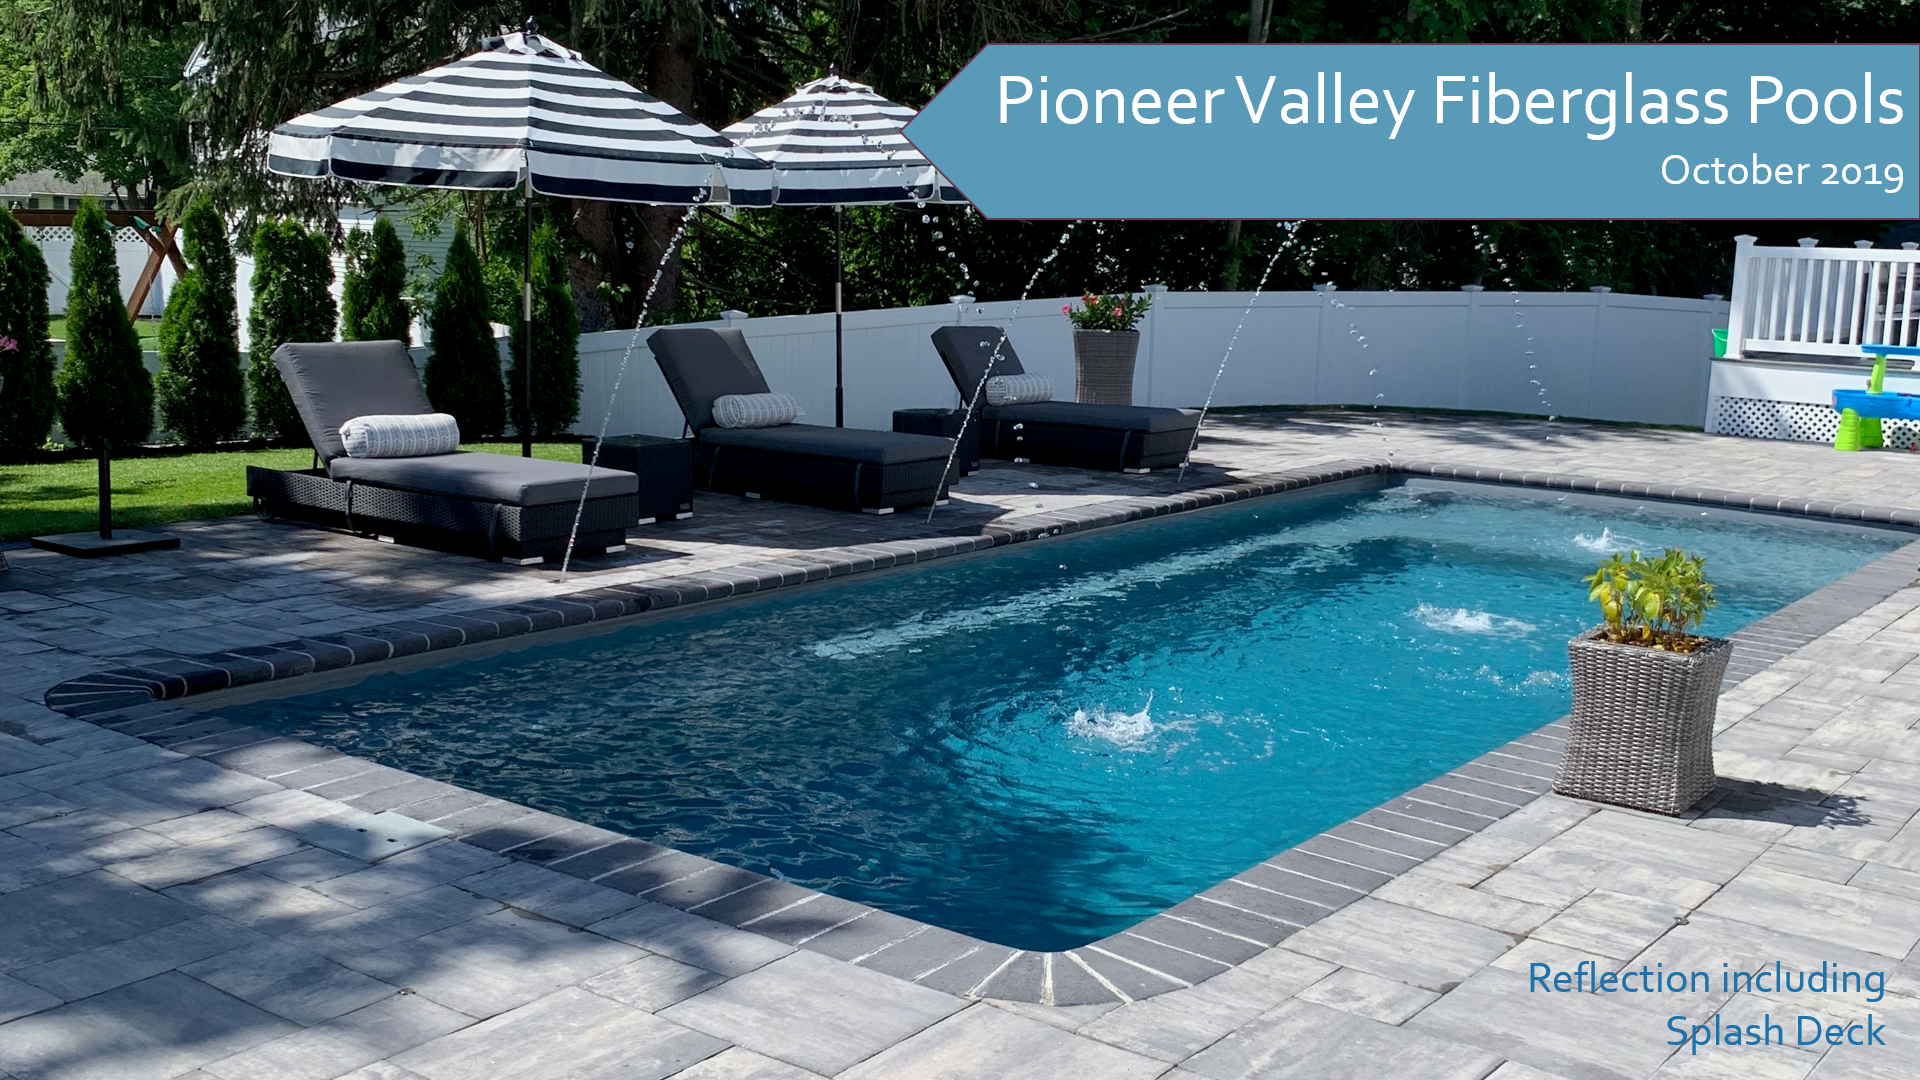 Leisure Pools Reflection Including Splash Deck Leisure Pools Swimming Pool House Pool